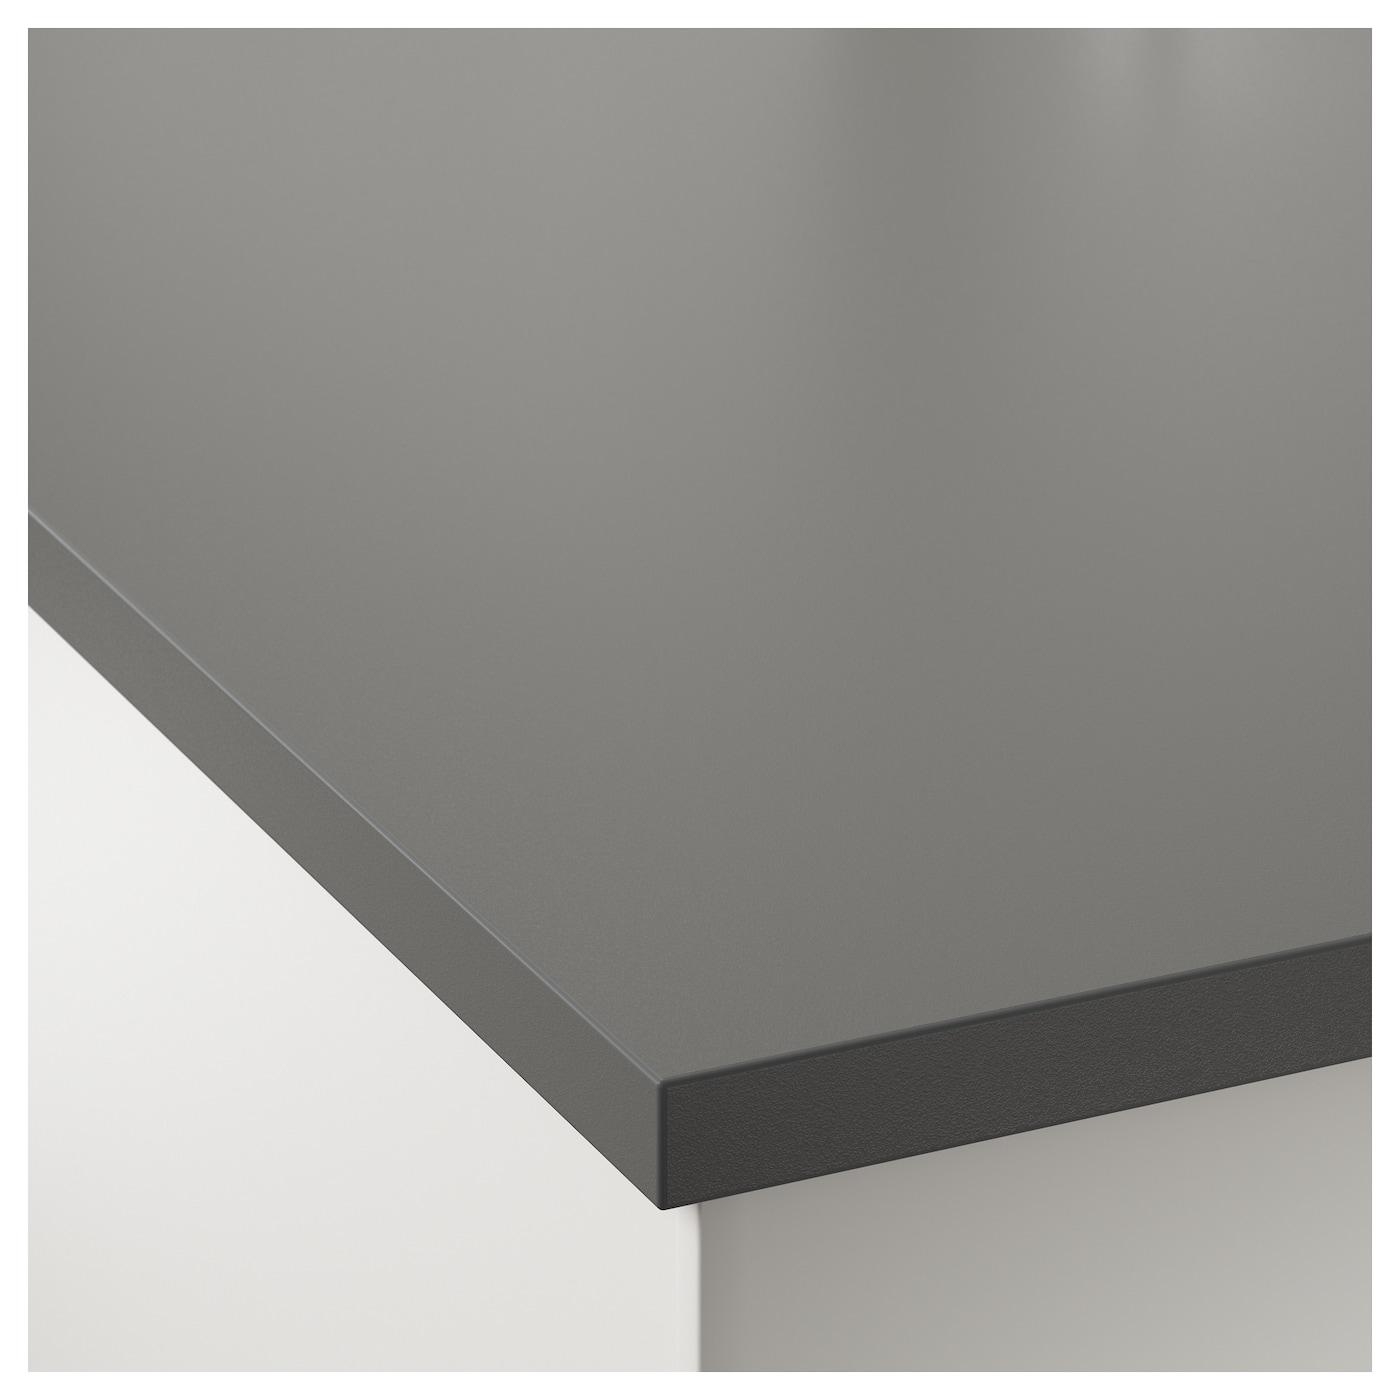 ekbacken custom made worktop dark grey laminate 10 45x2 8. Black Bedroom Furniture Sets. Home Design Ideas